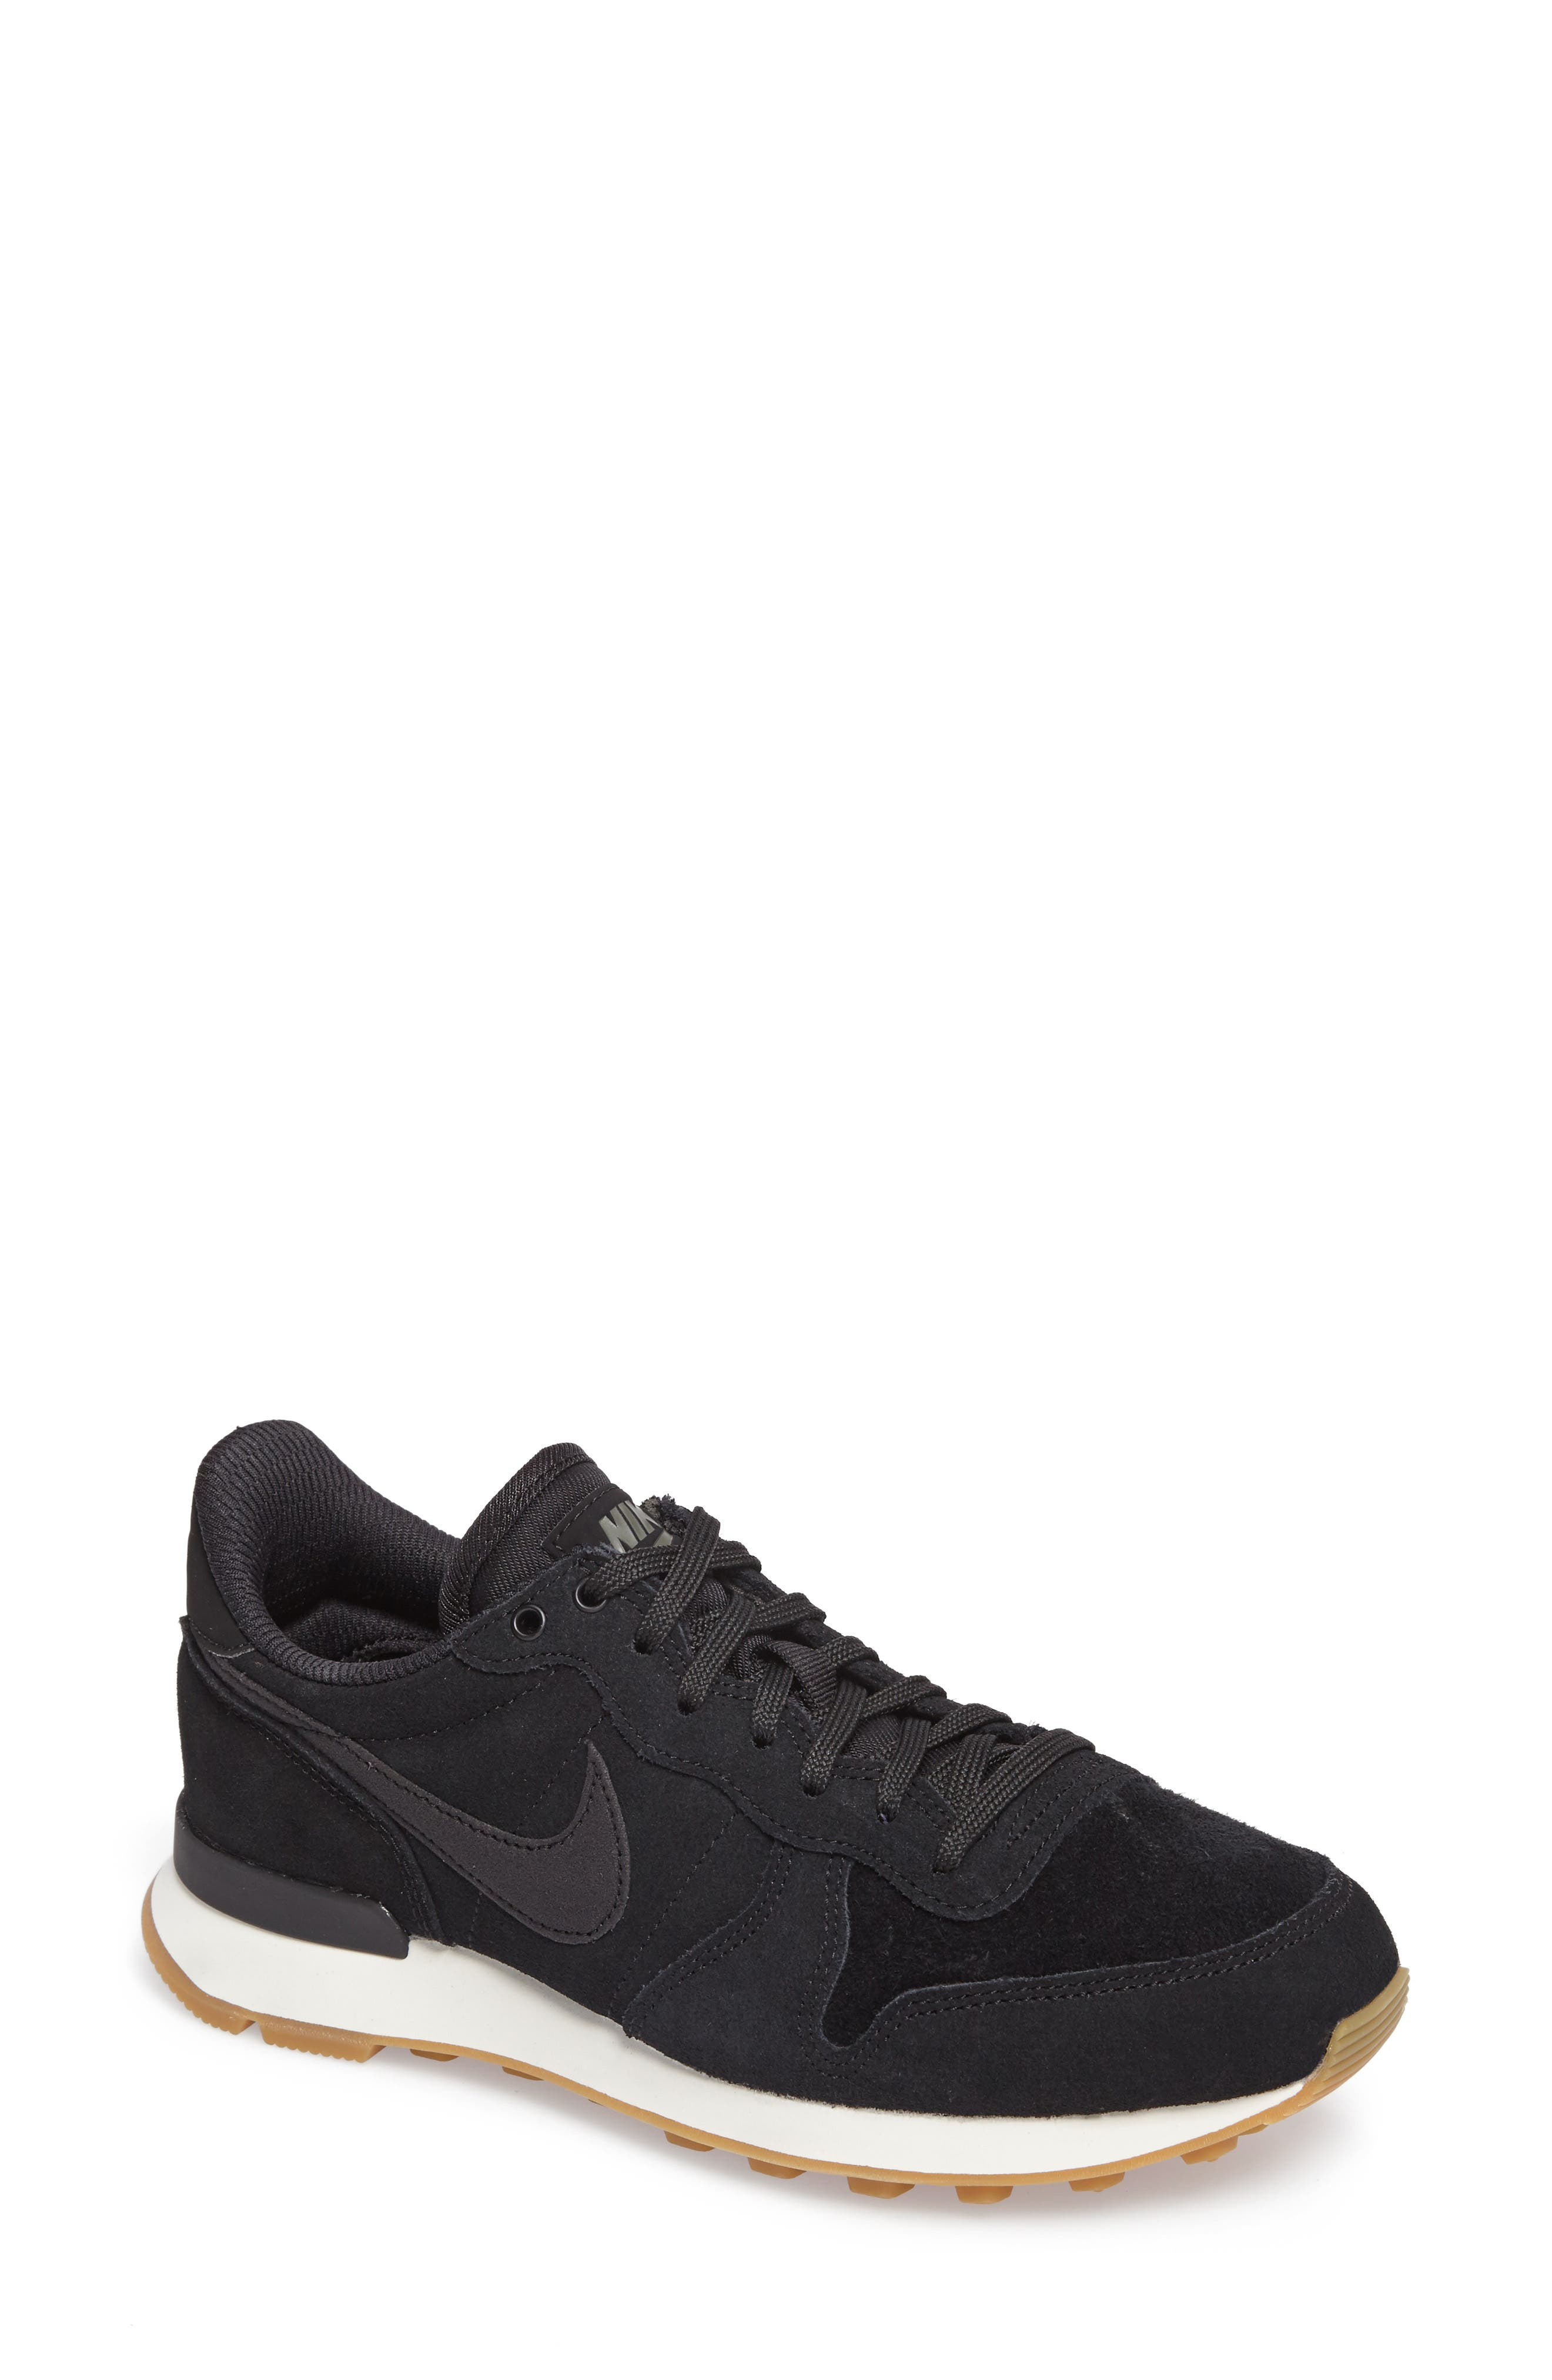 Internationalist SE Sneaker,                             Main thumbnail 1, color,                             002